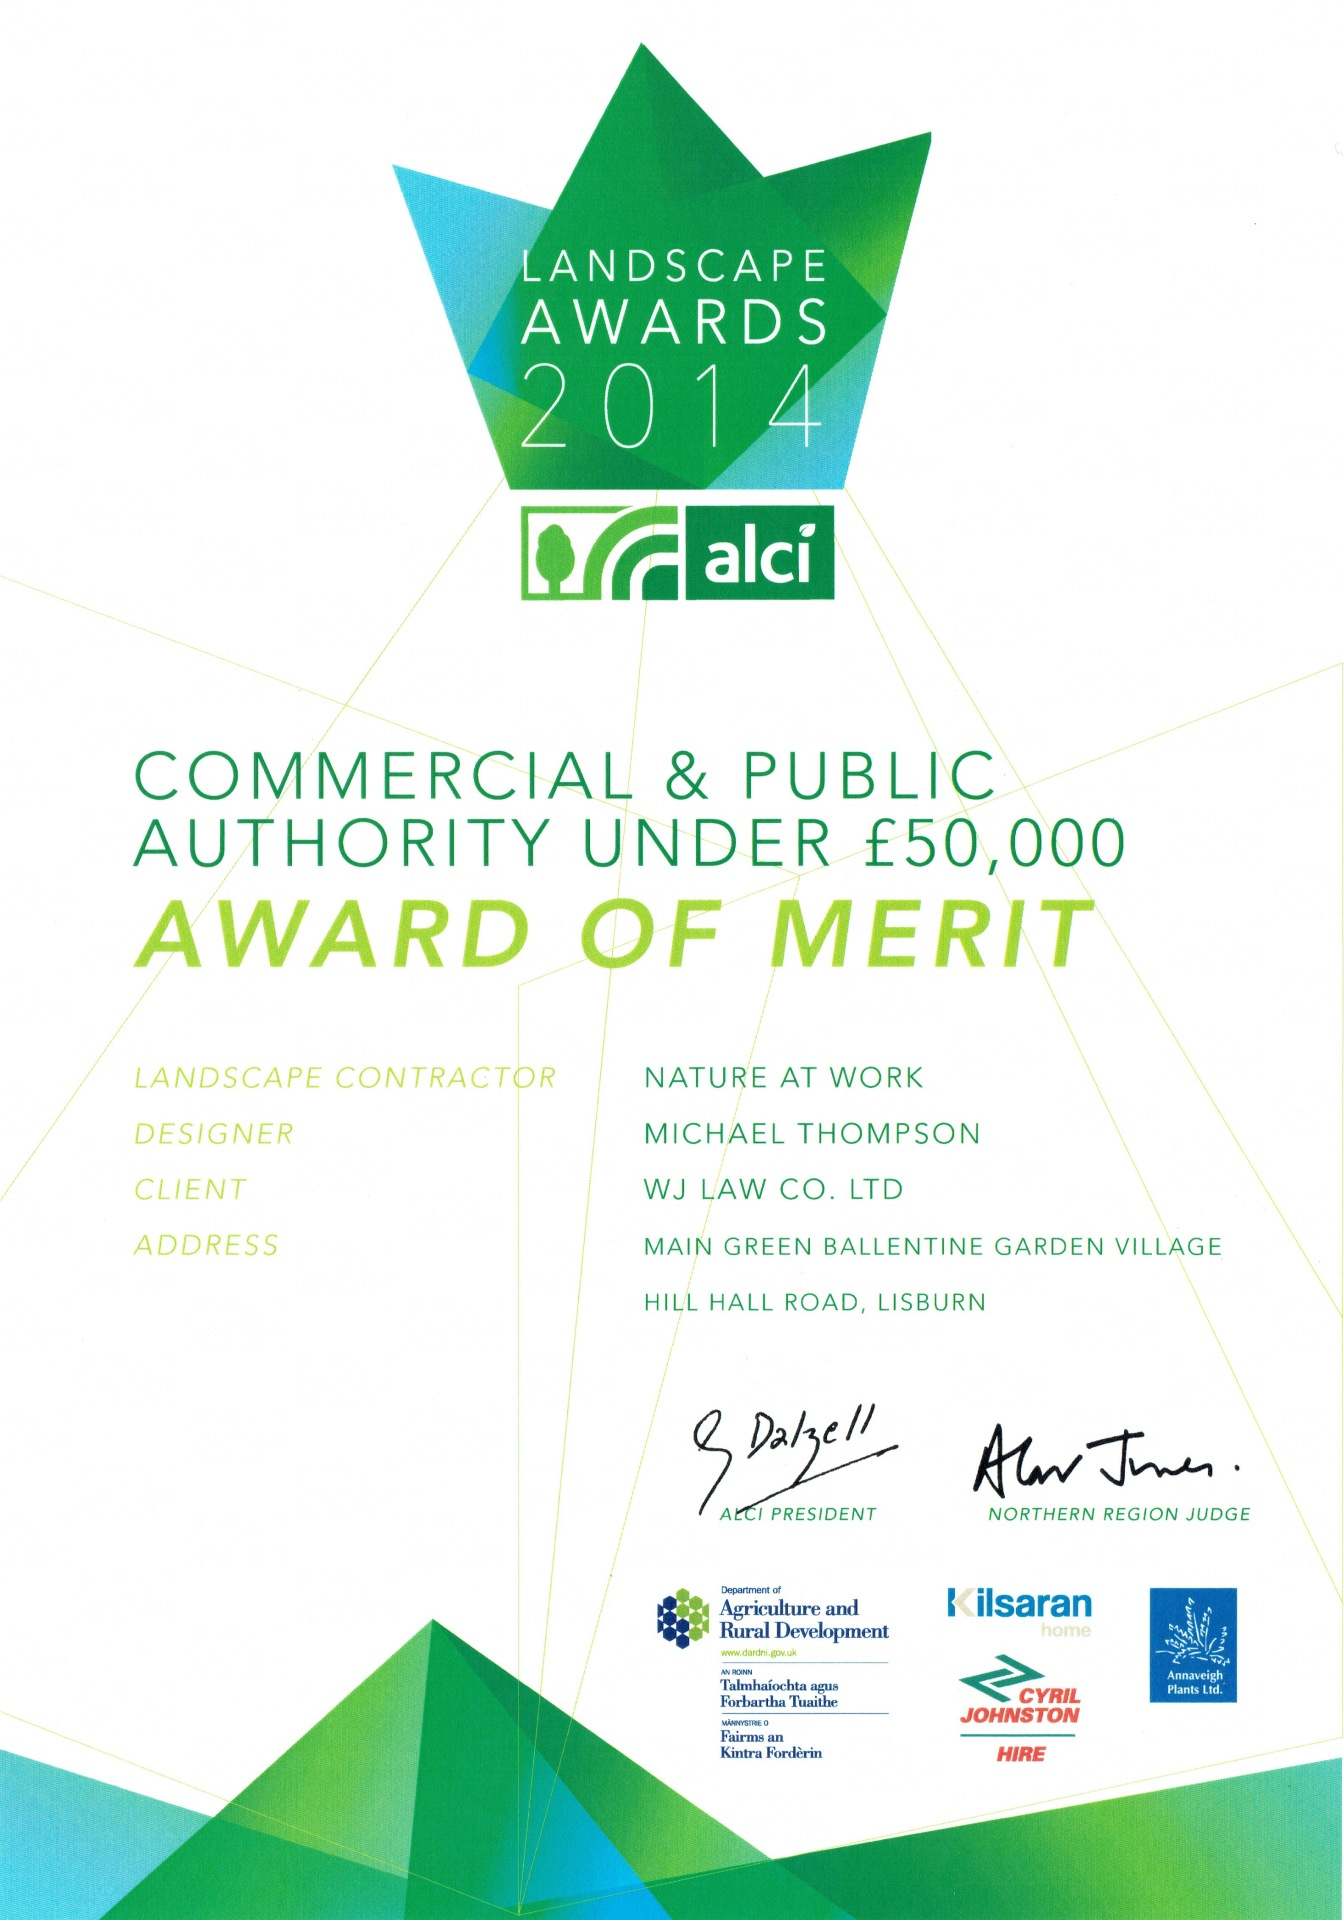 ALCI 2014 Awards Commercial & Public Authority Under £50,000